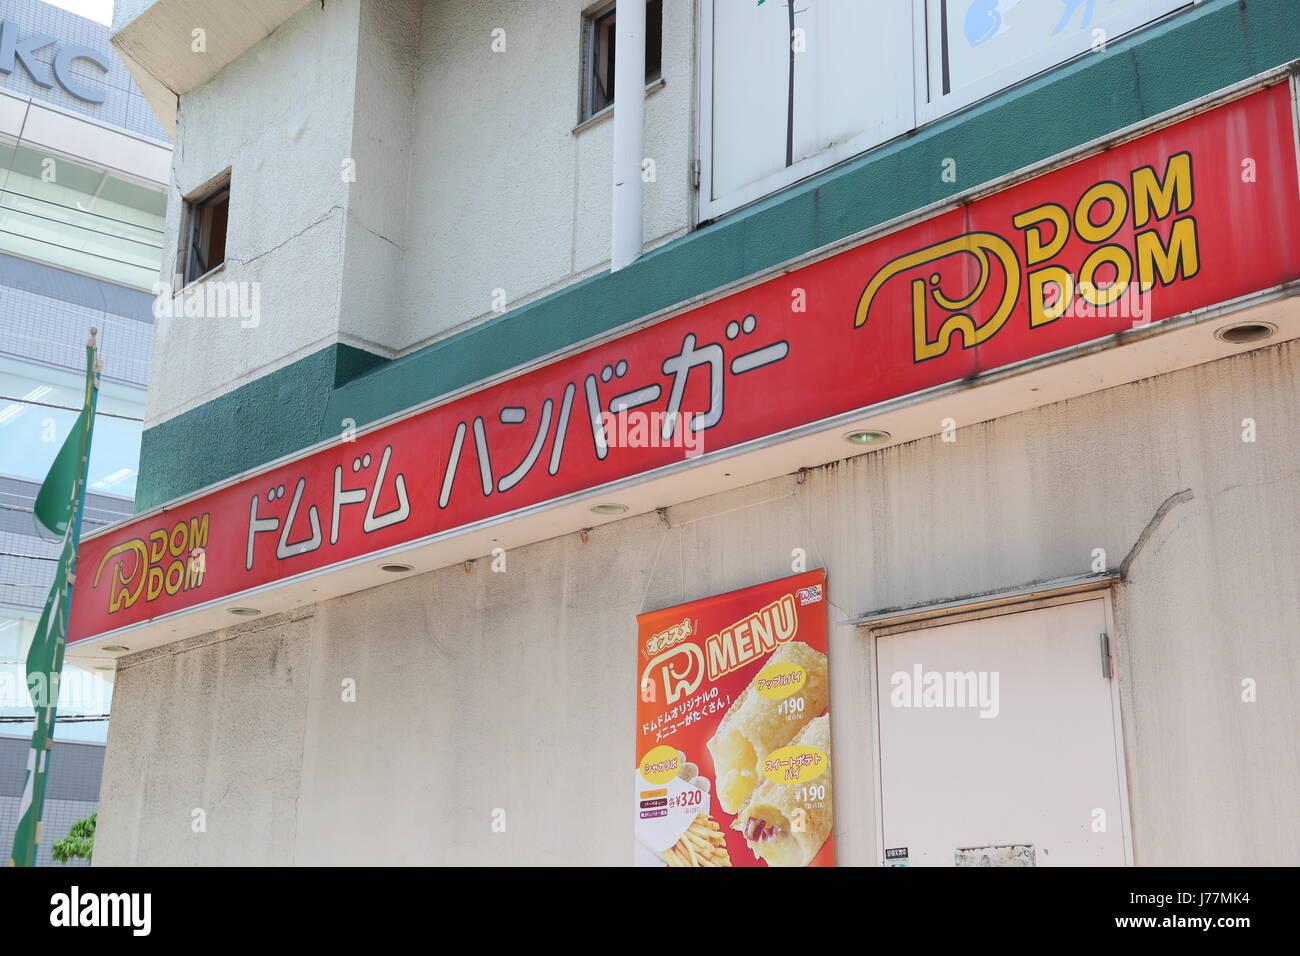 Chain of fast food restaurants Tokyo City: reviews, addresses, menu 91